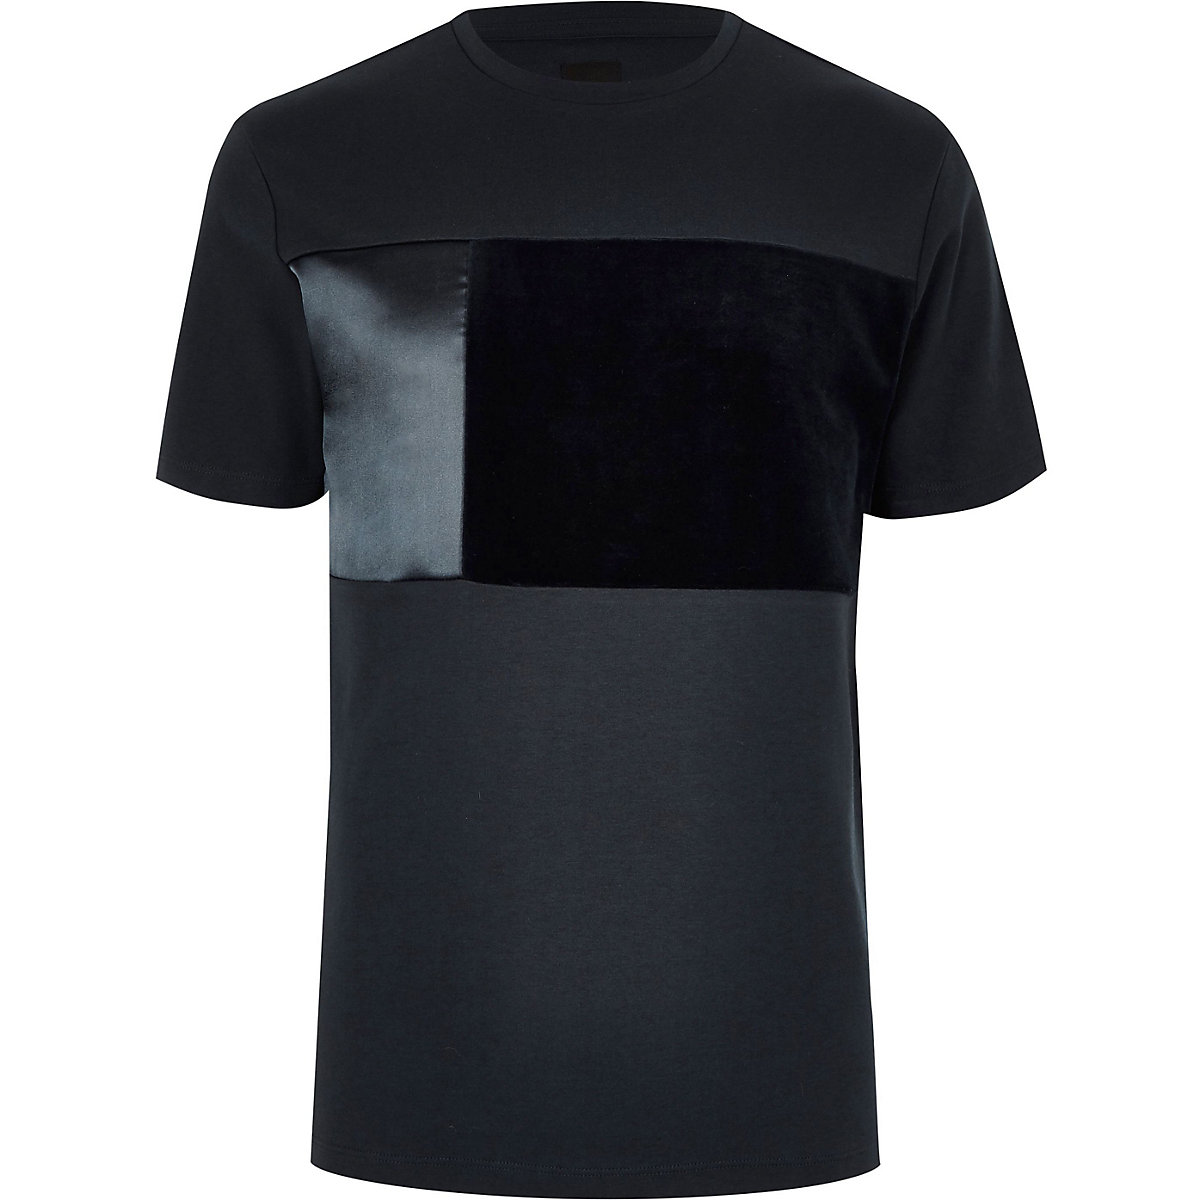 Big and Tall navy block crew neck T-shirt